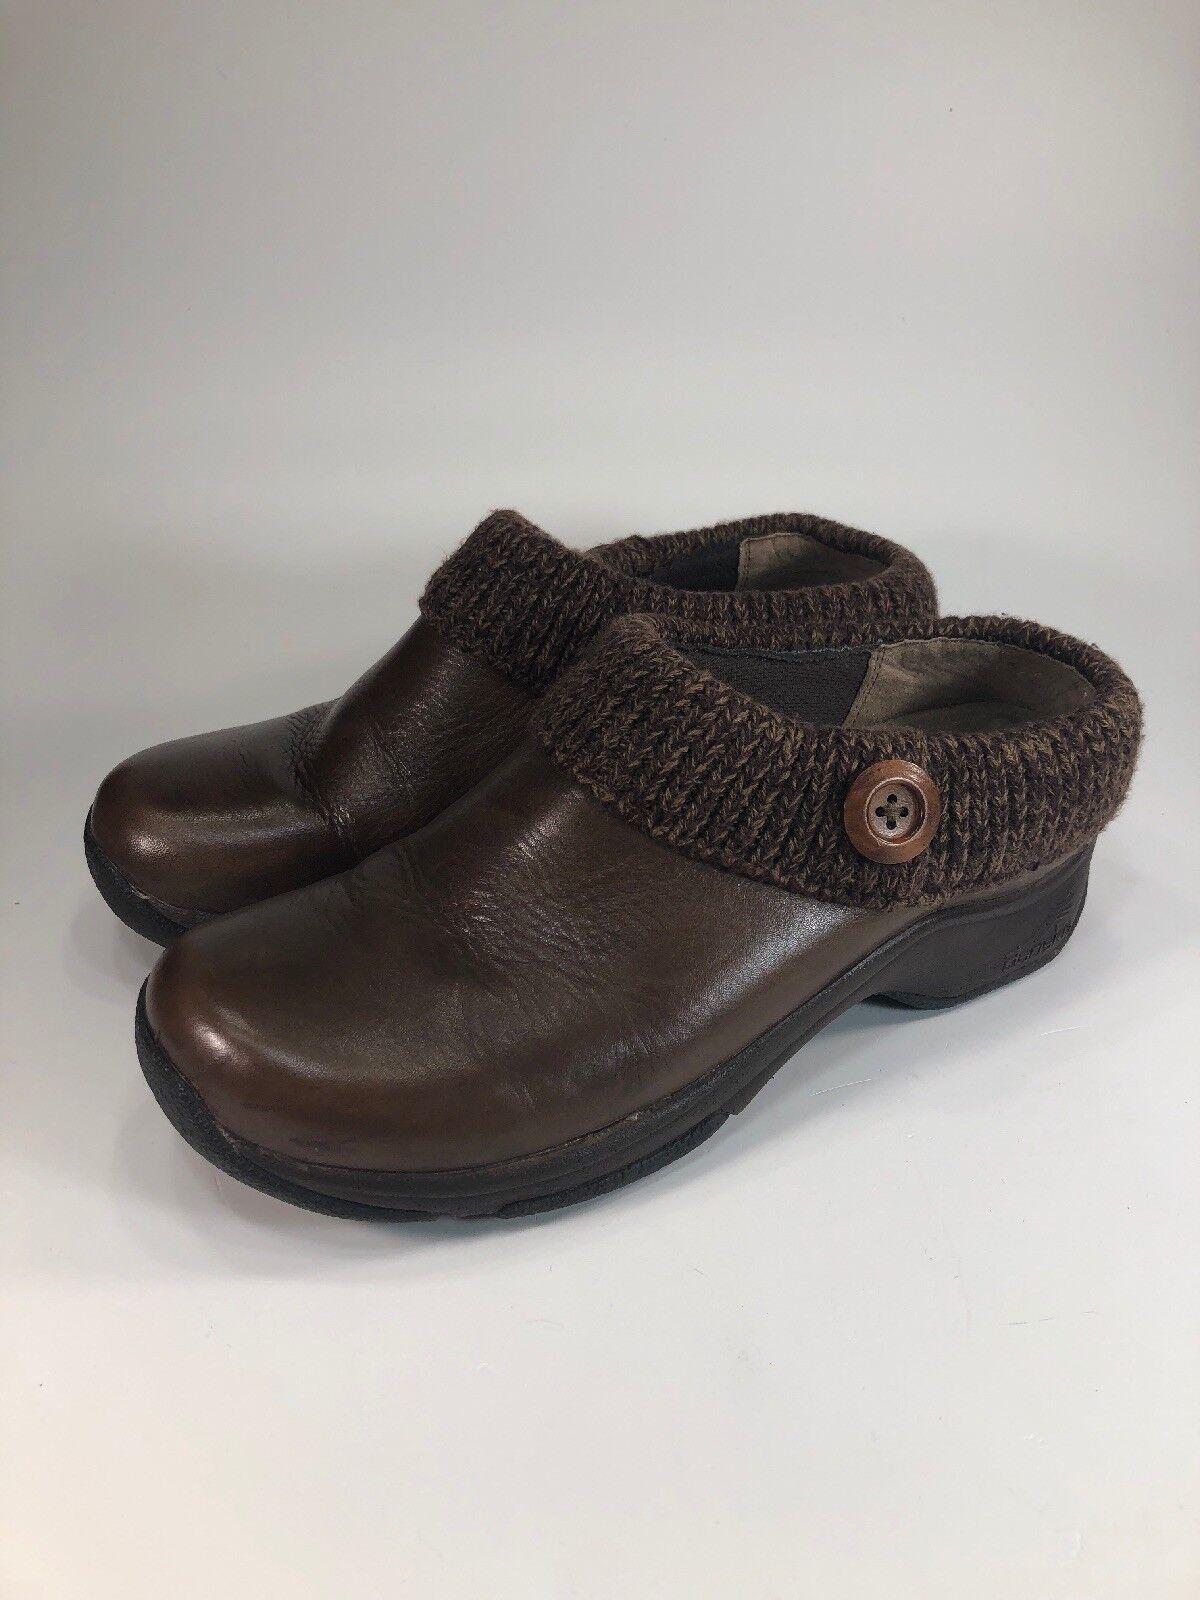 Dansko Brown Leather Slip On Clogs Knit Lined Womens Size 9.5 M EU40